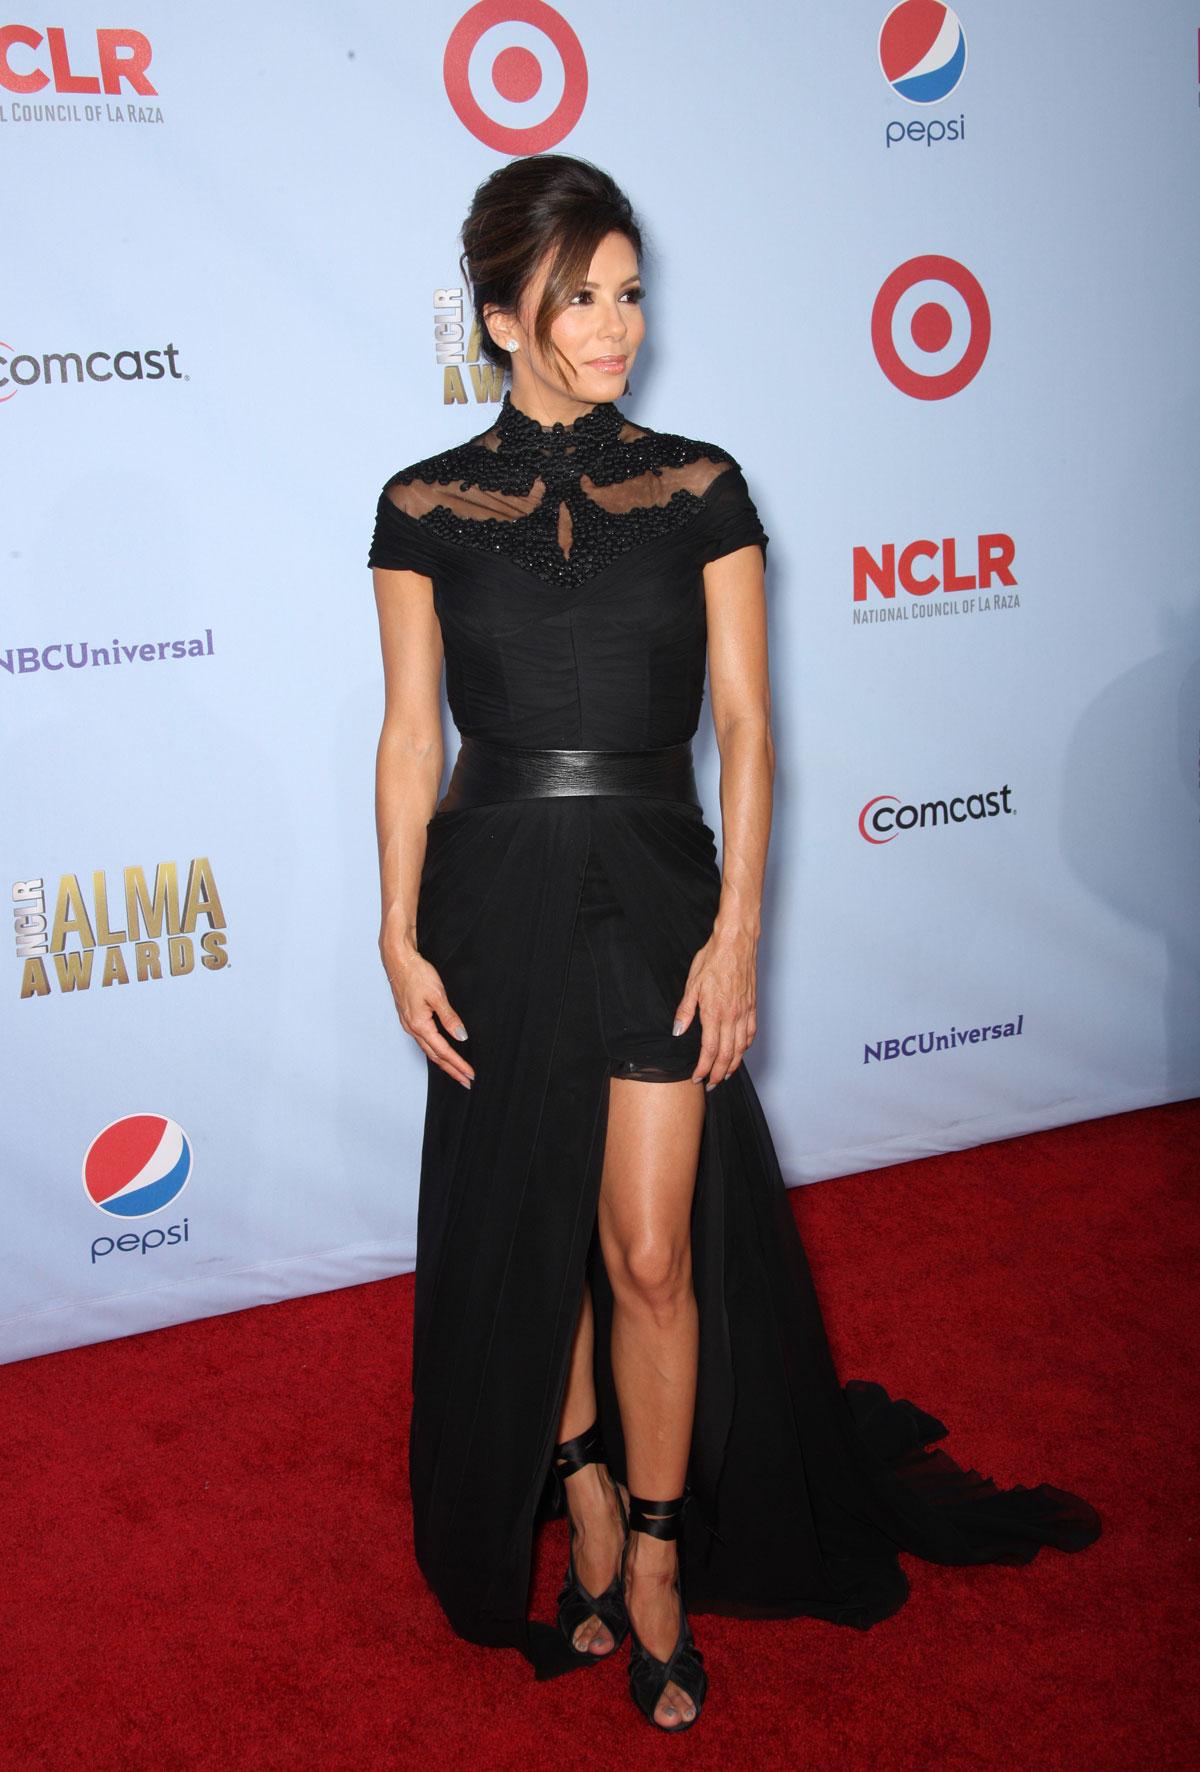 EVA LONGORIA at 2012 NCLR ALMA Awards in Pasadena - HawtCelebs ... Eva Longoria